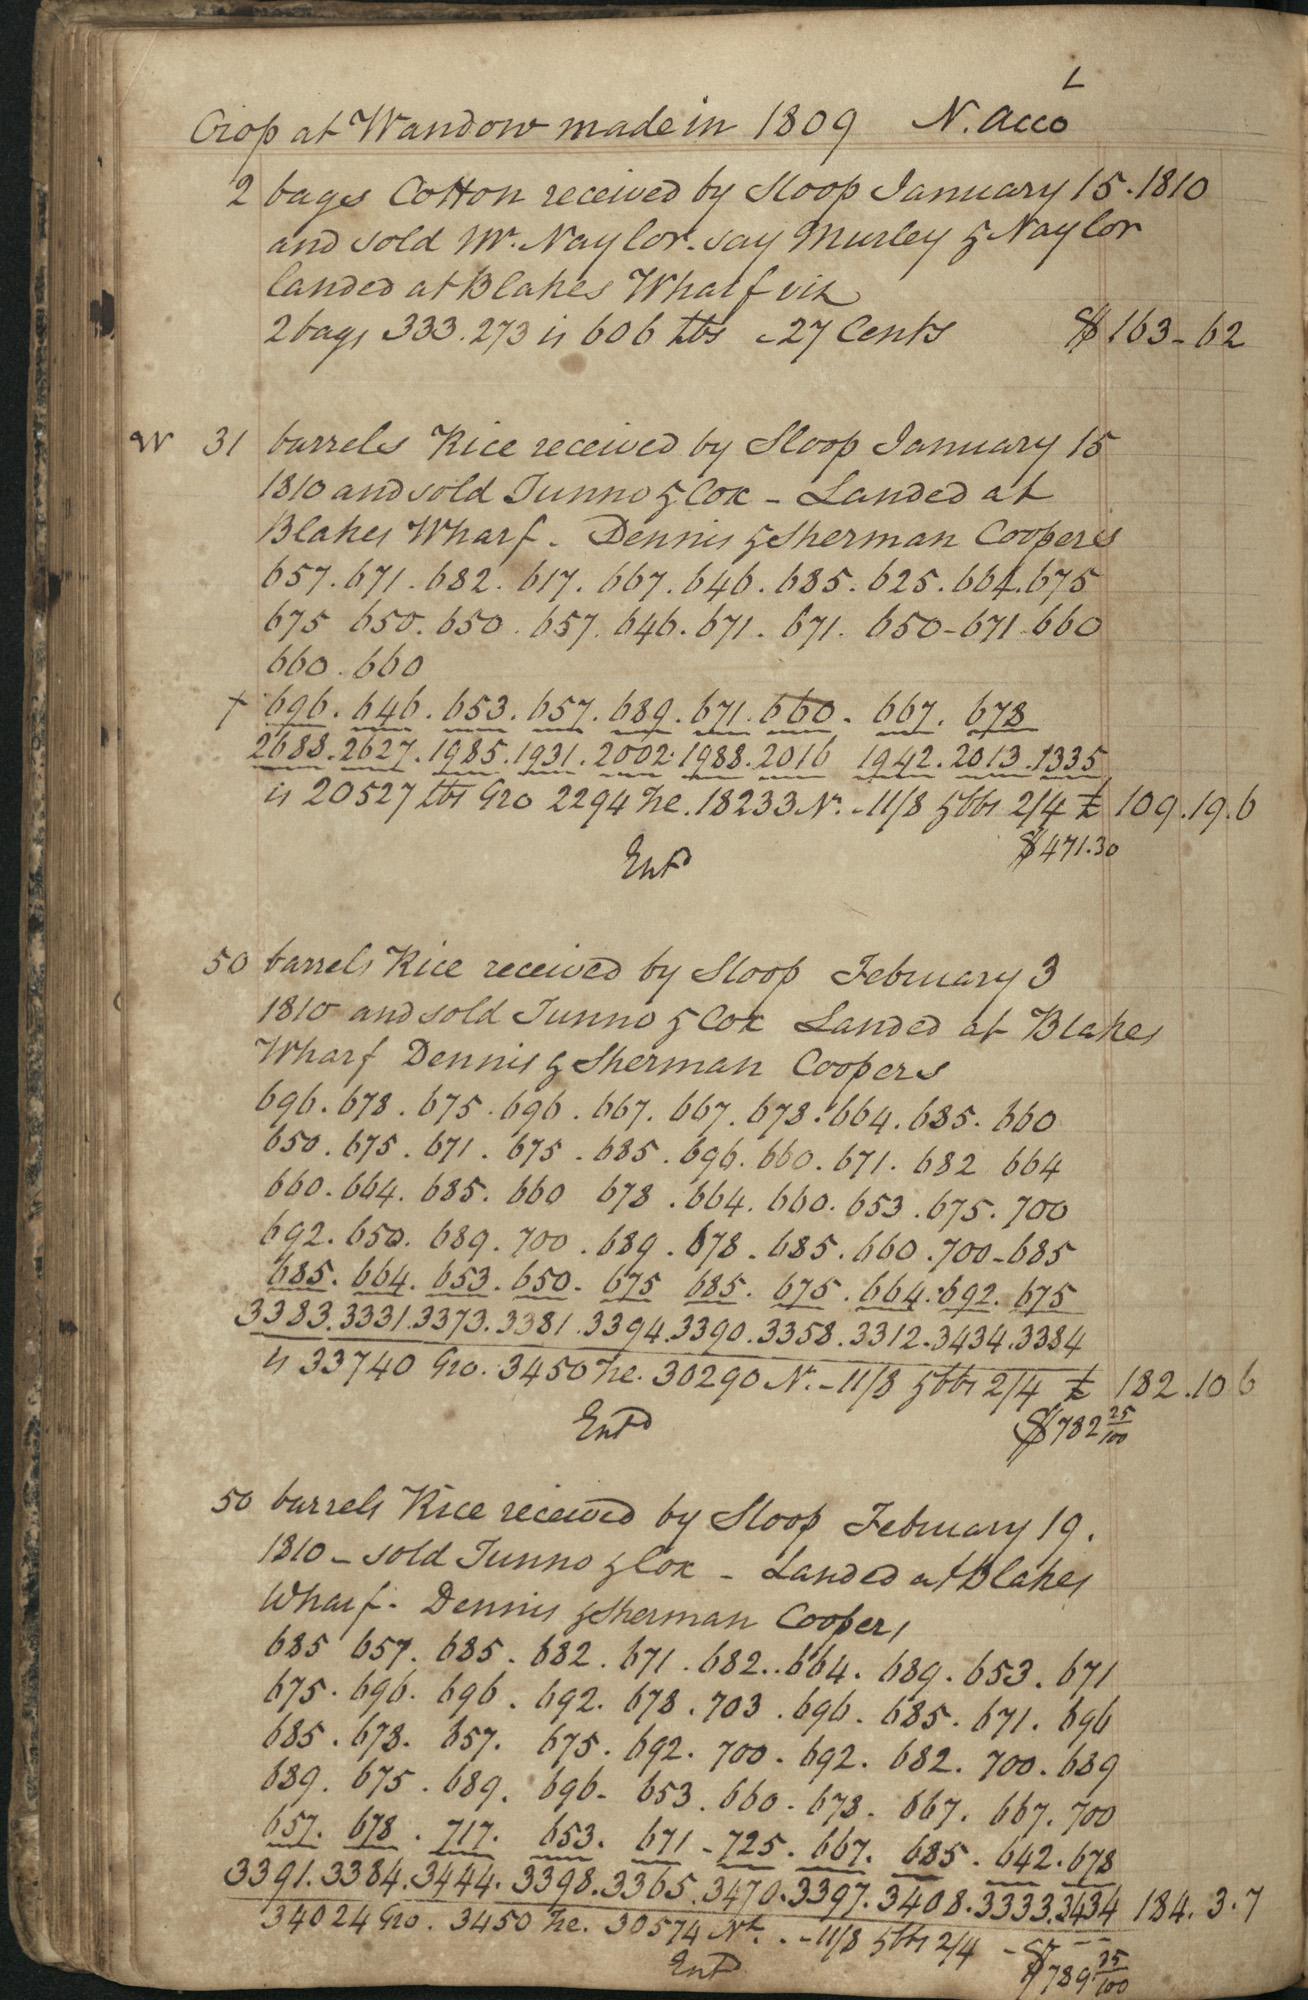 Plowden Weston's Plantation Journal, page 104